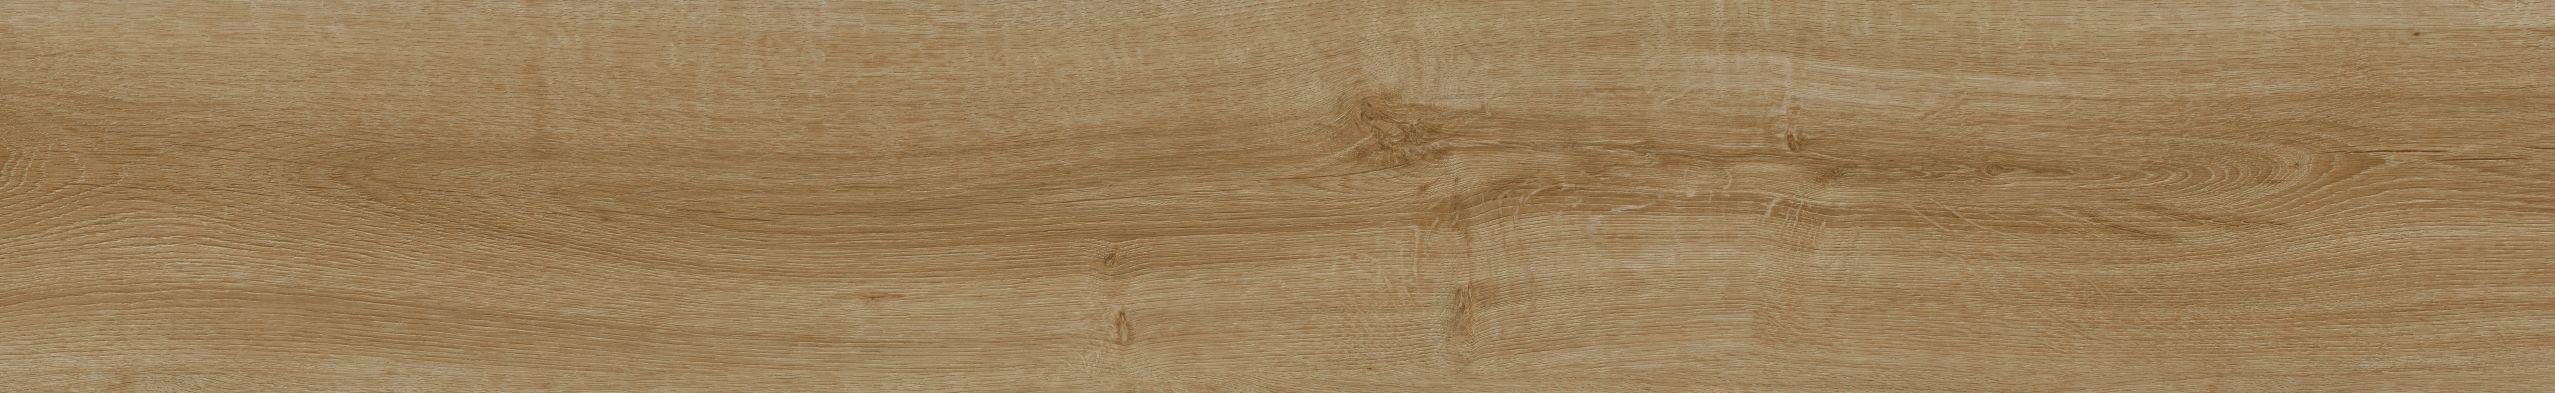 Panele winylowe LVT modulari ® WOOD DRYBACK 19,6 x 132 cm 24432